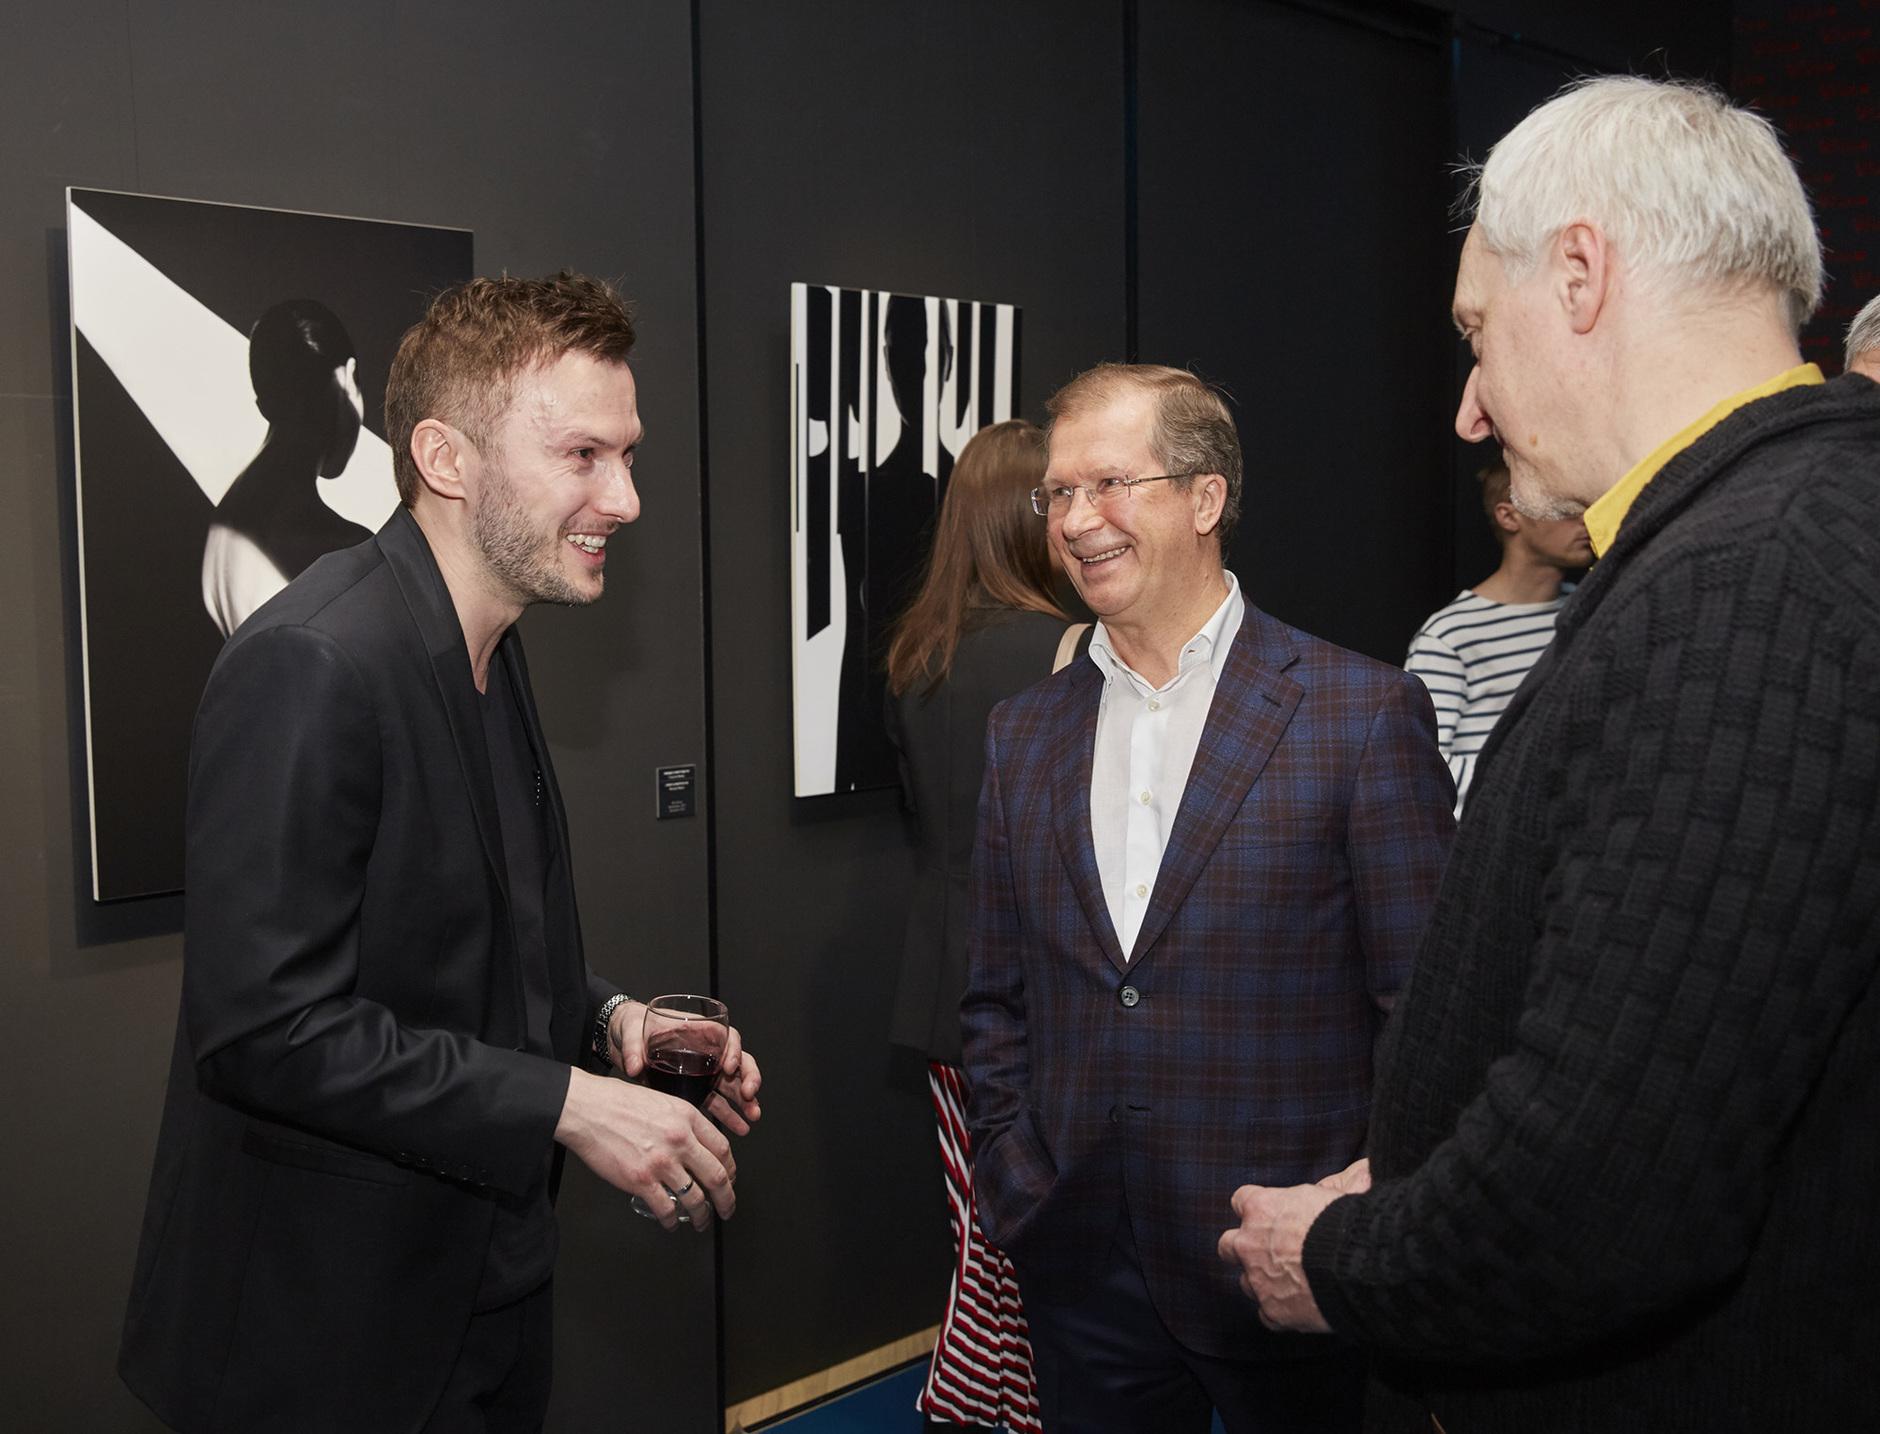 Выставка «Майер VS Брюханов» в арт-галерее VS Unio (галерея 6, фото 1)